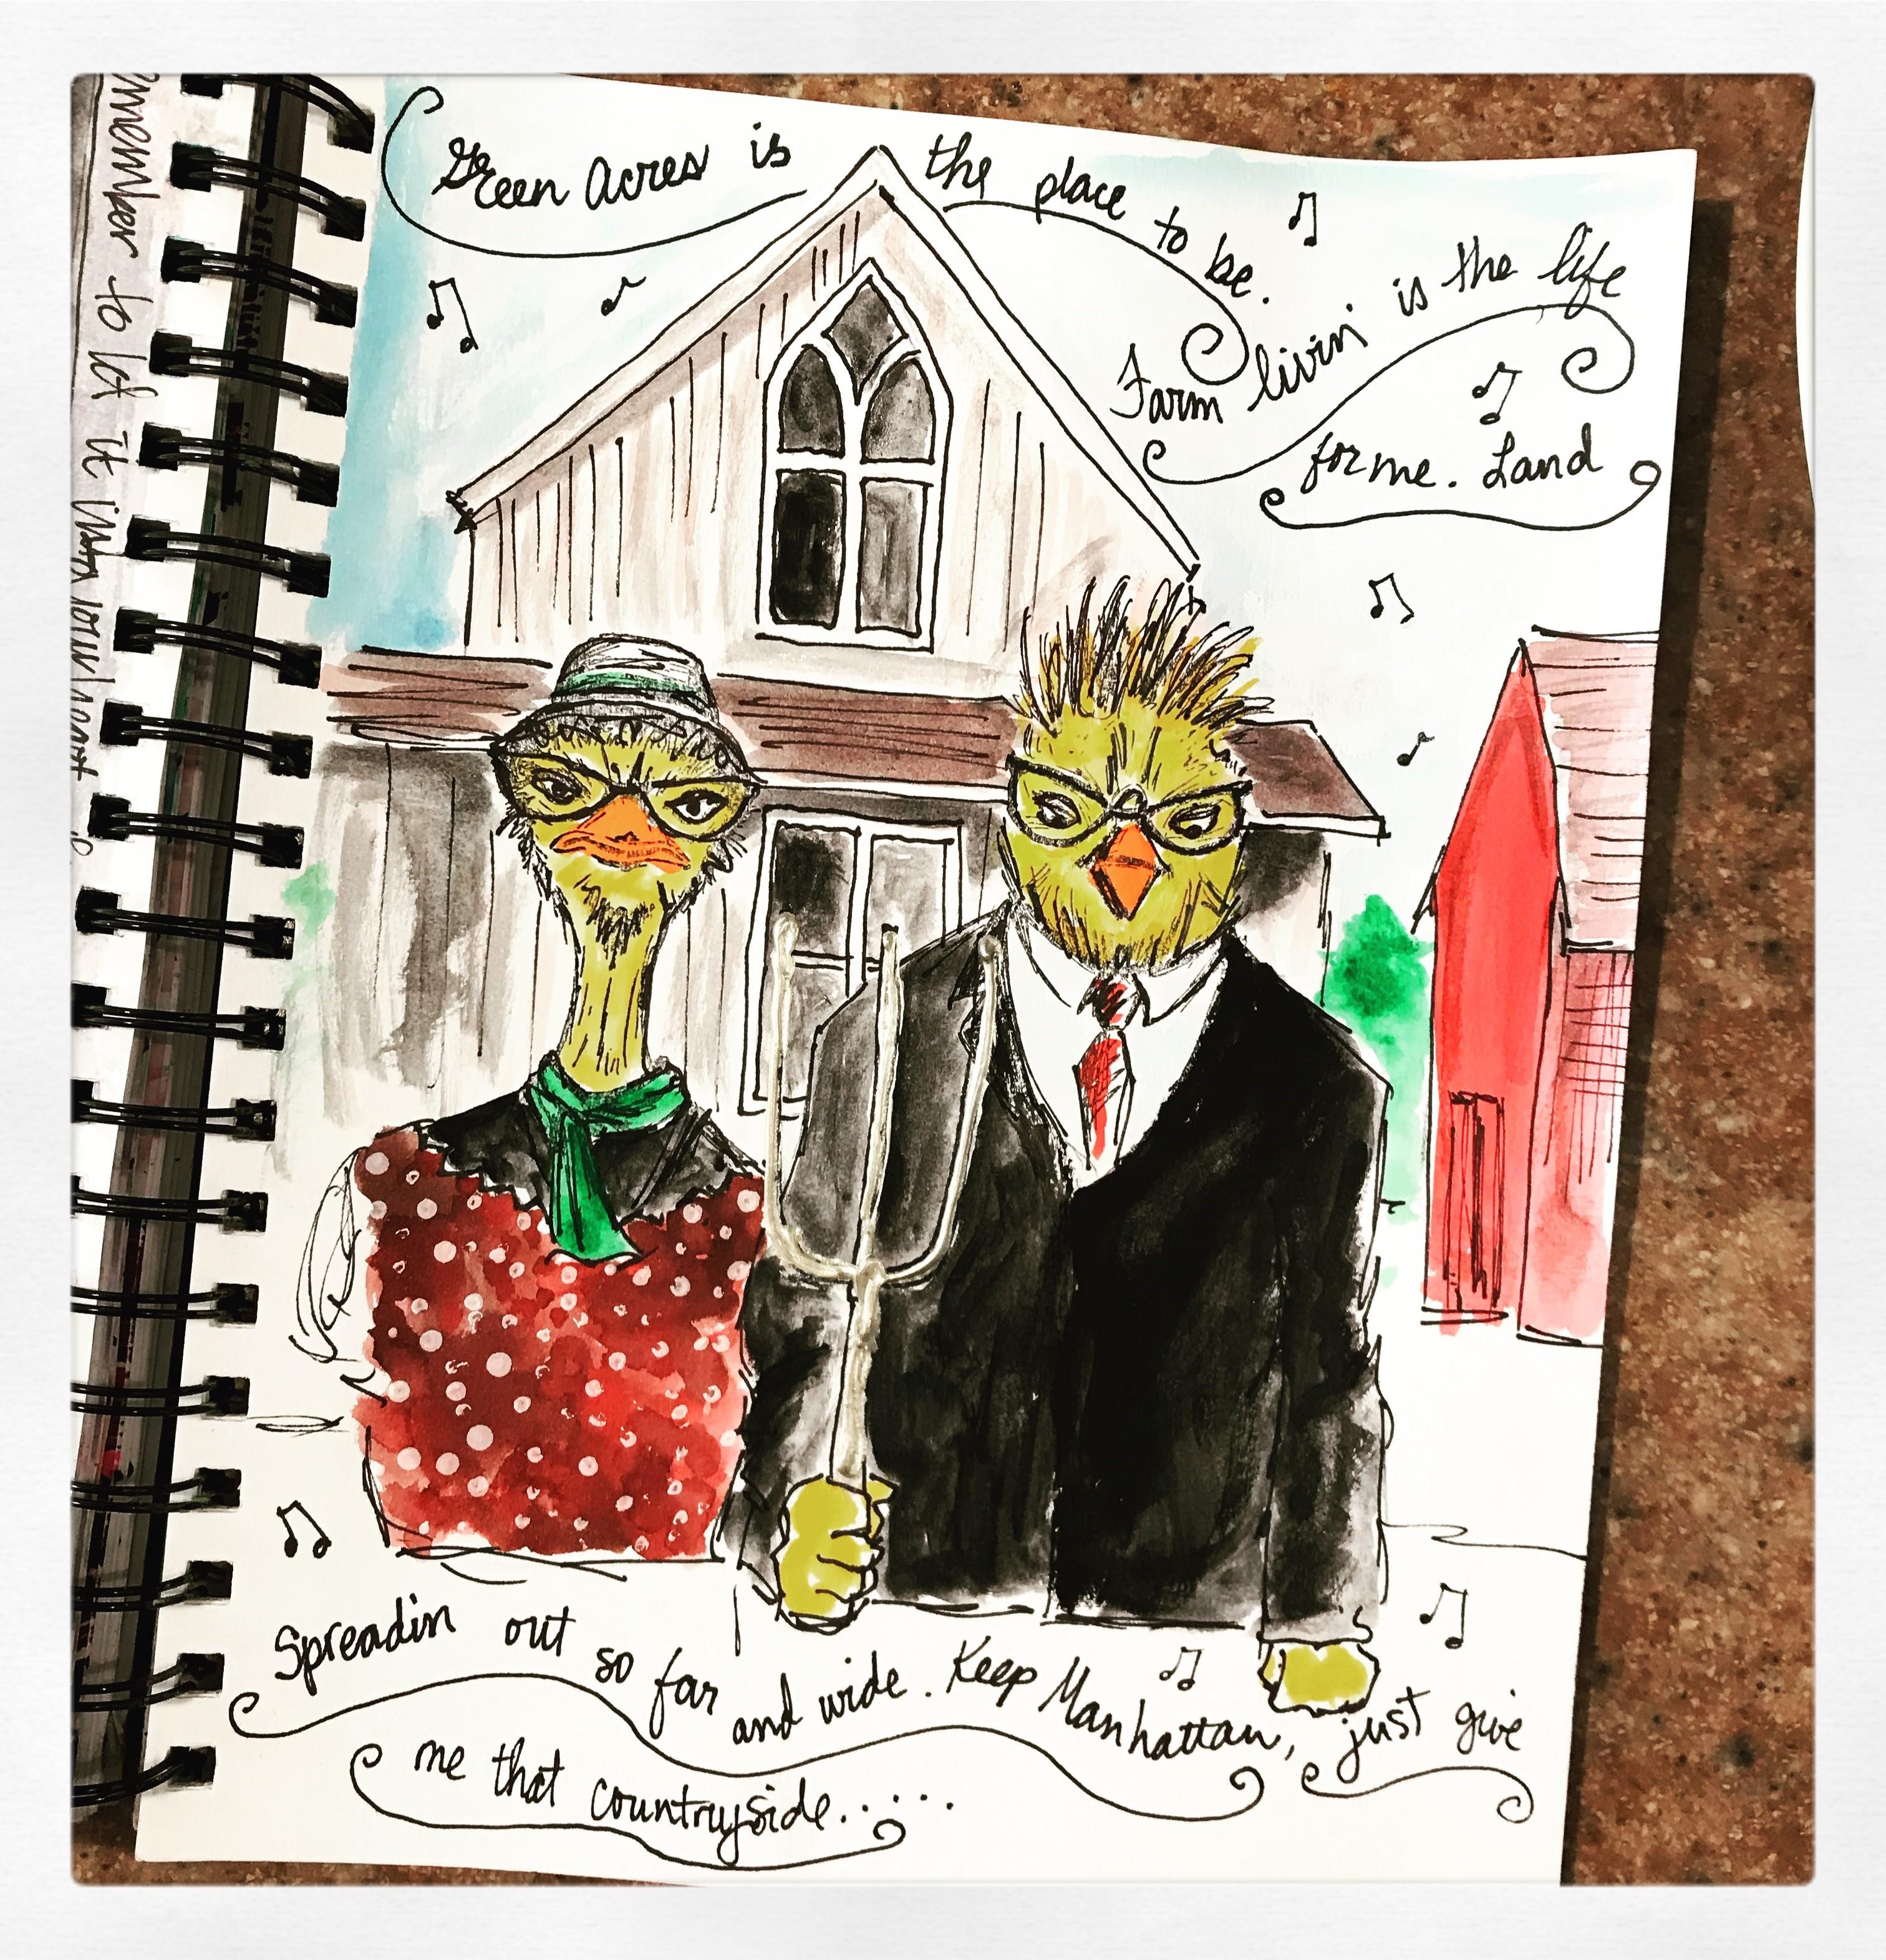 Song Lyric - Green Acres